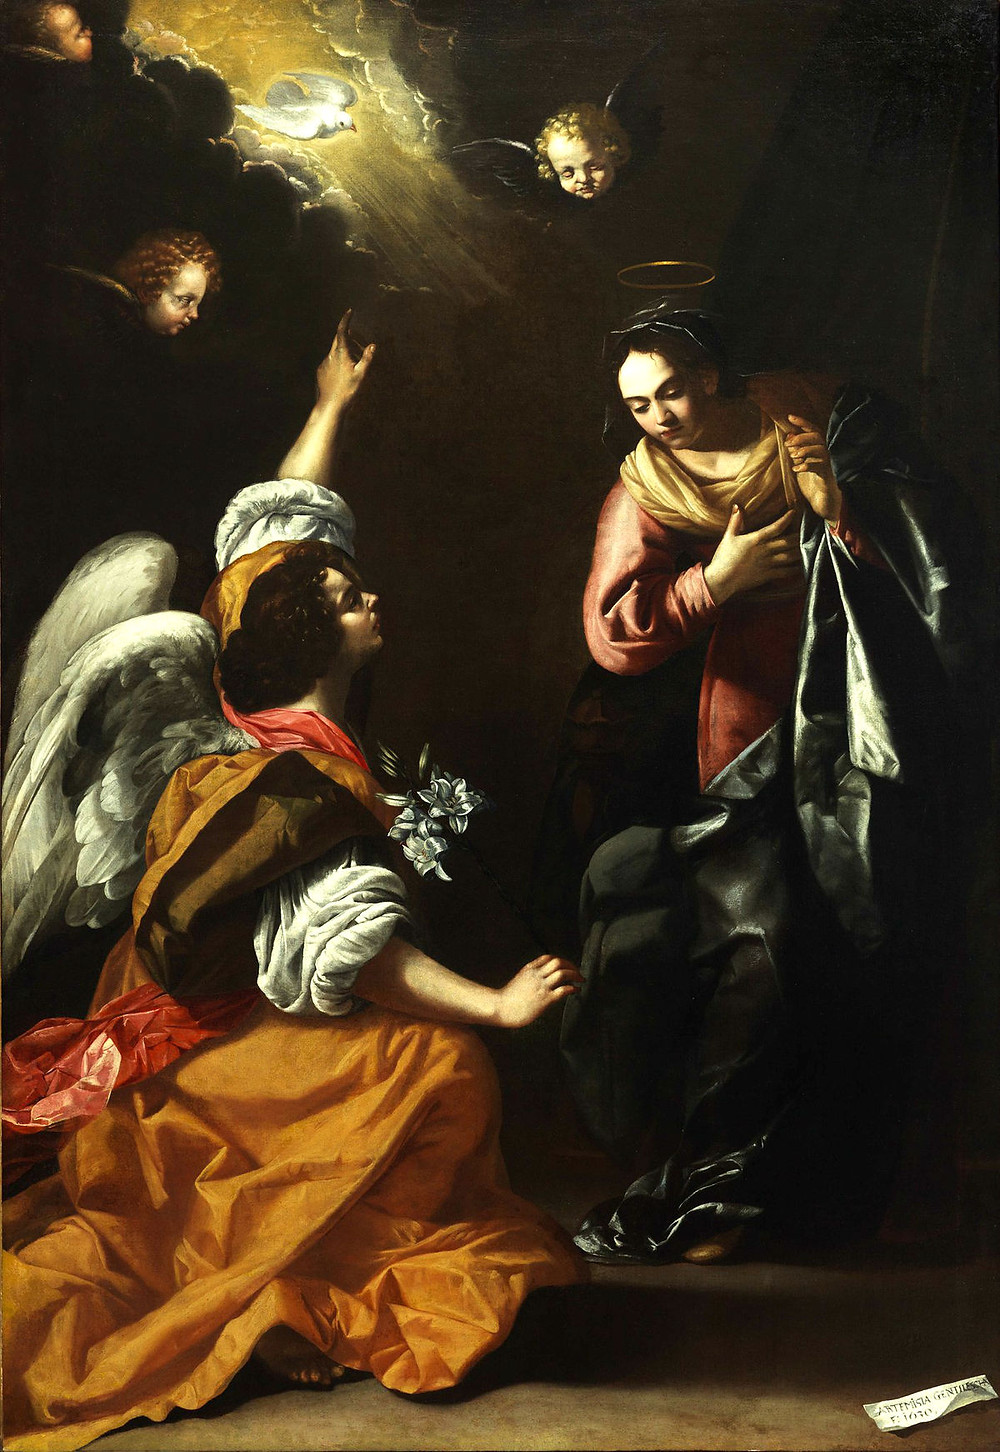 Artemisia Gentileschi, The Annunciation, 1630